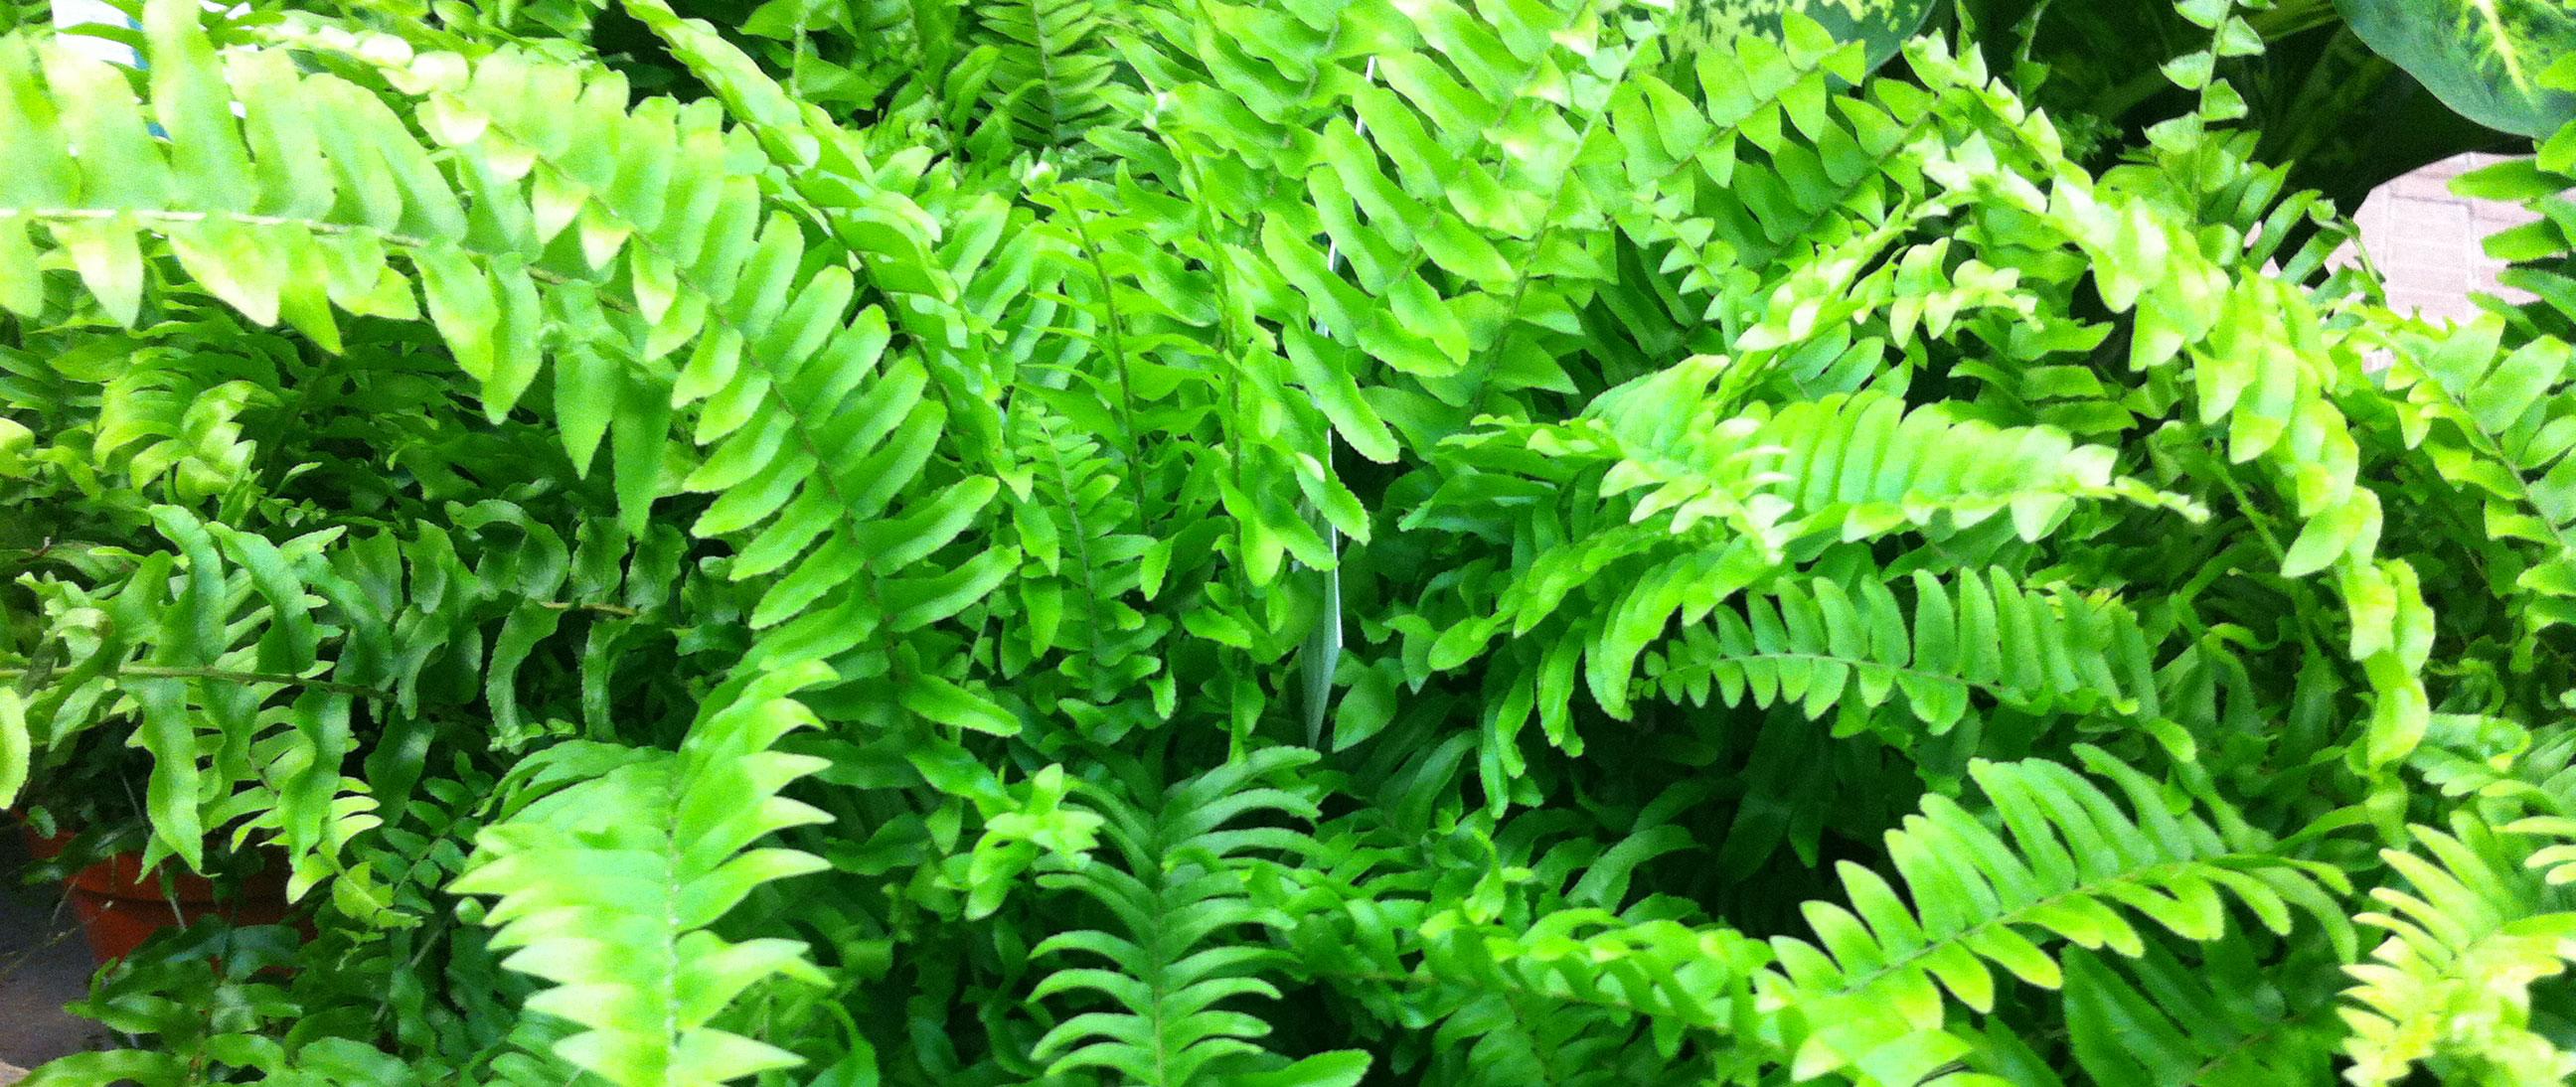 Plante anti humidit sanotint light tabella colori - Plante interieur anti humidite ...